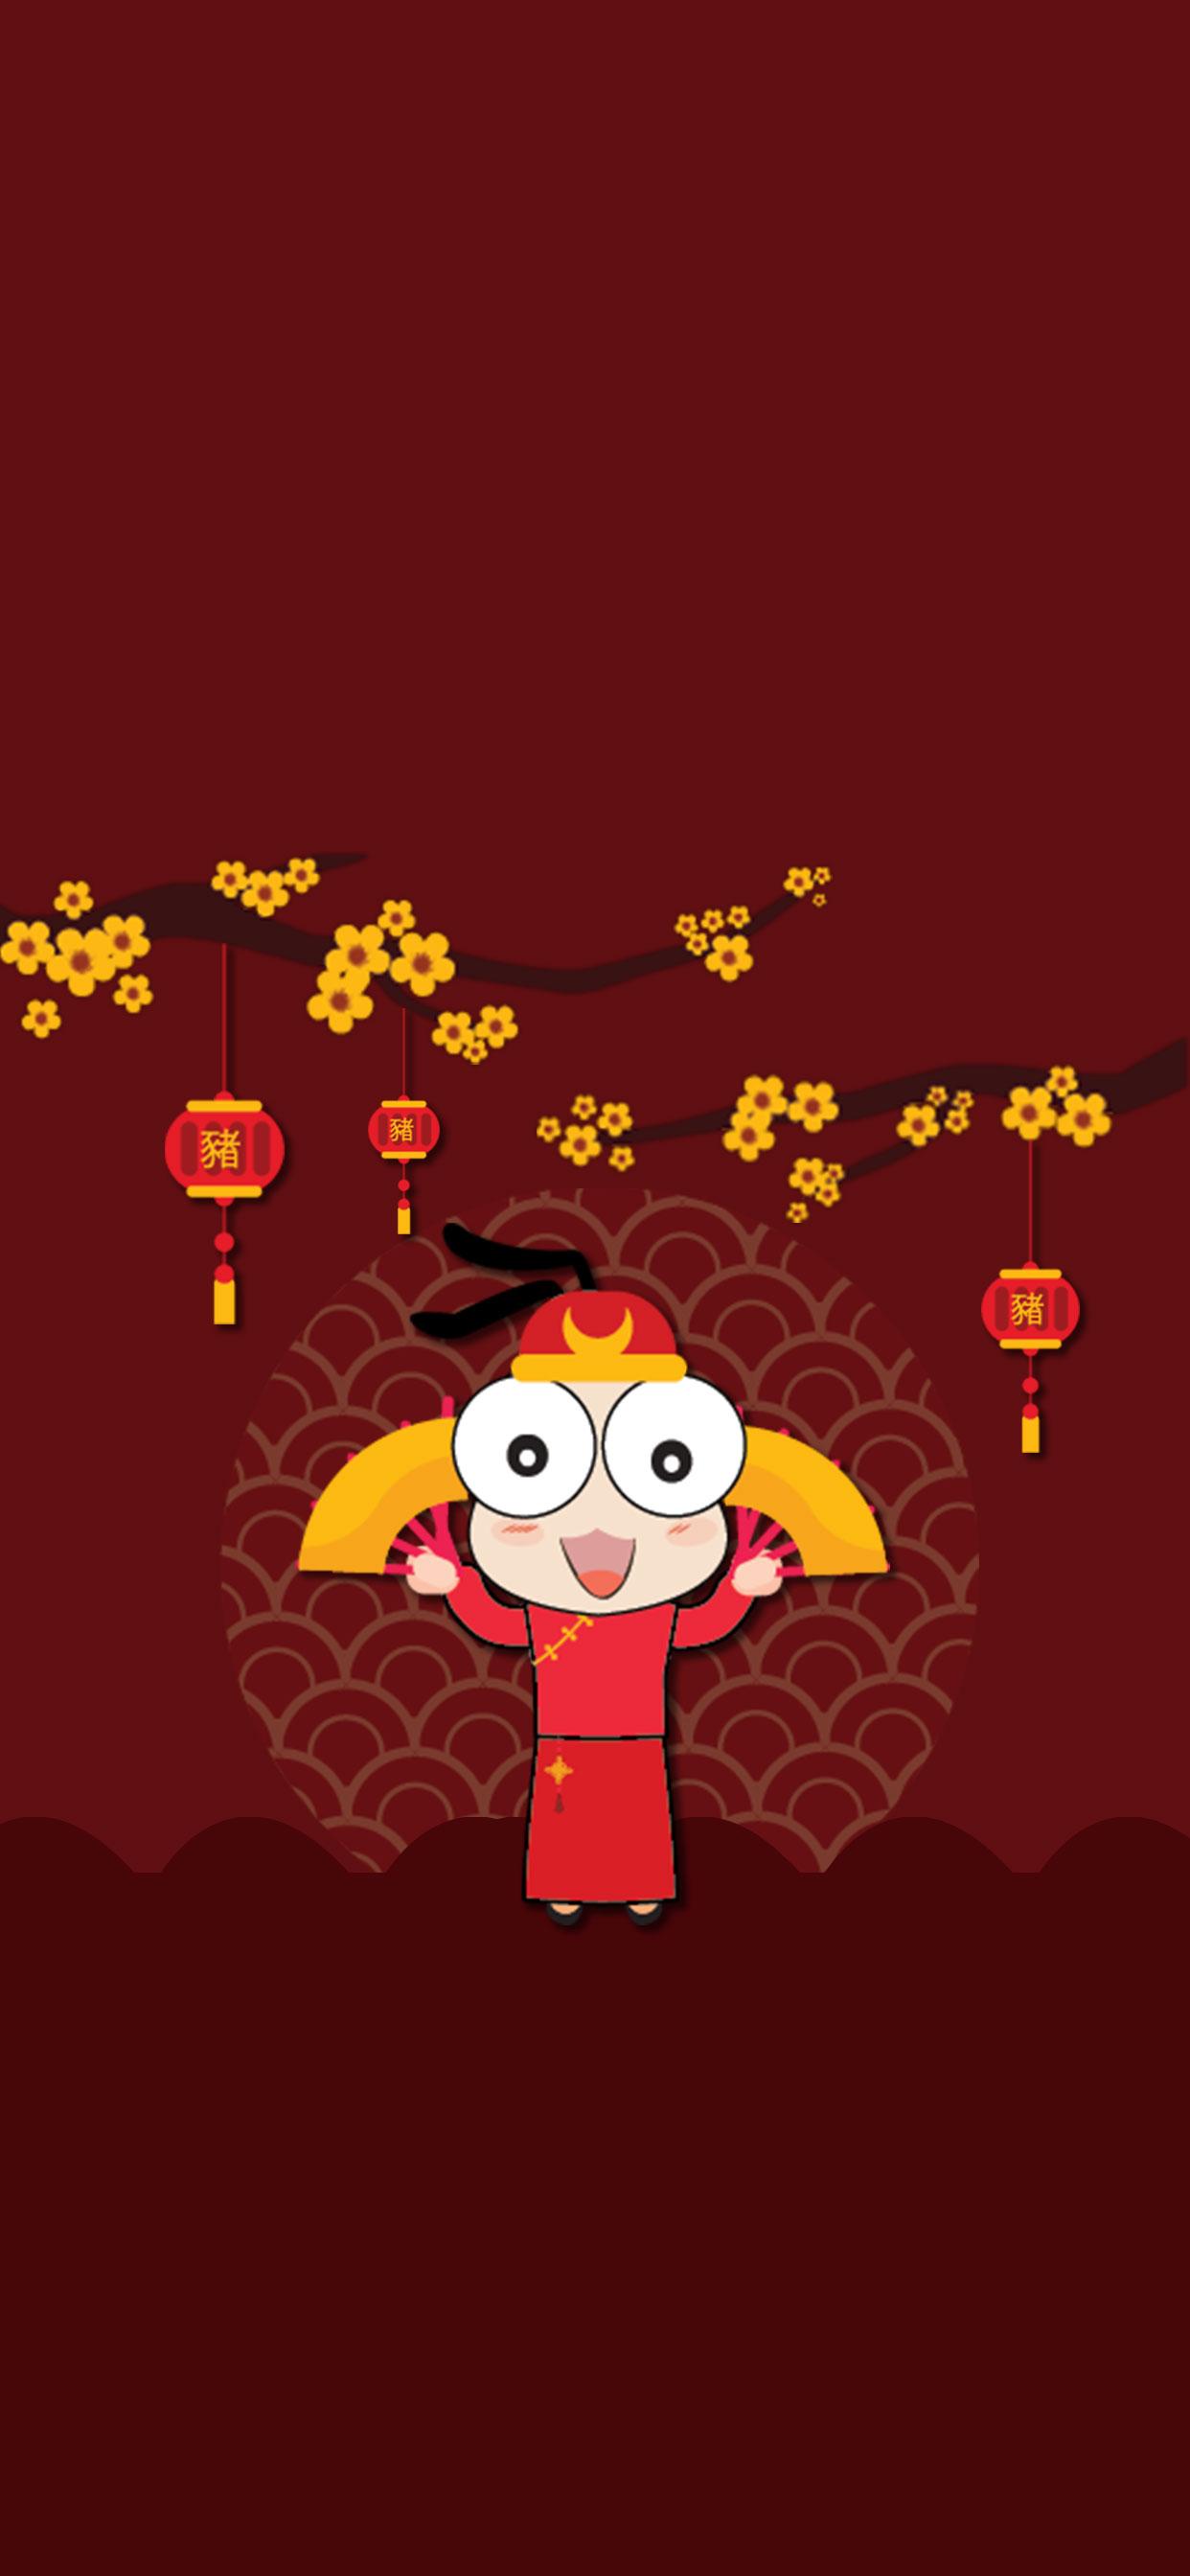 Wall Chinese 5